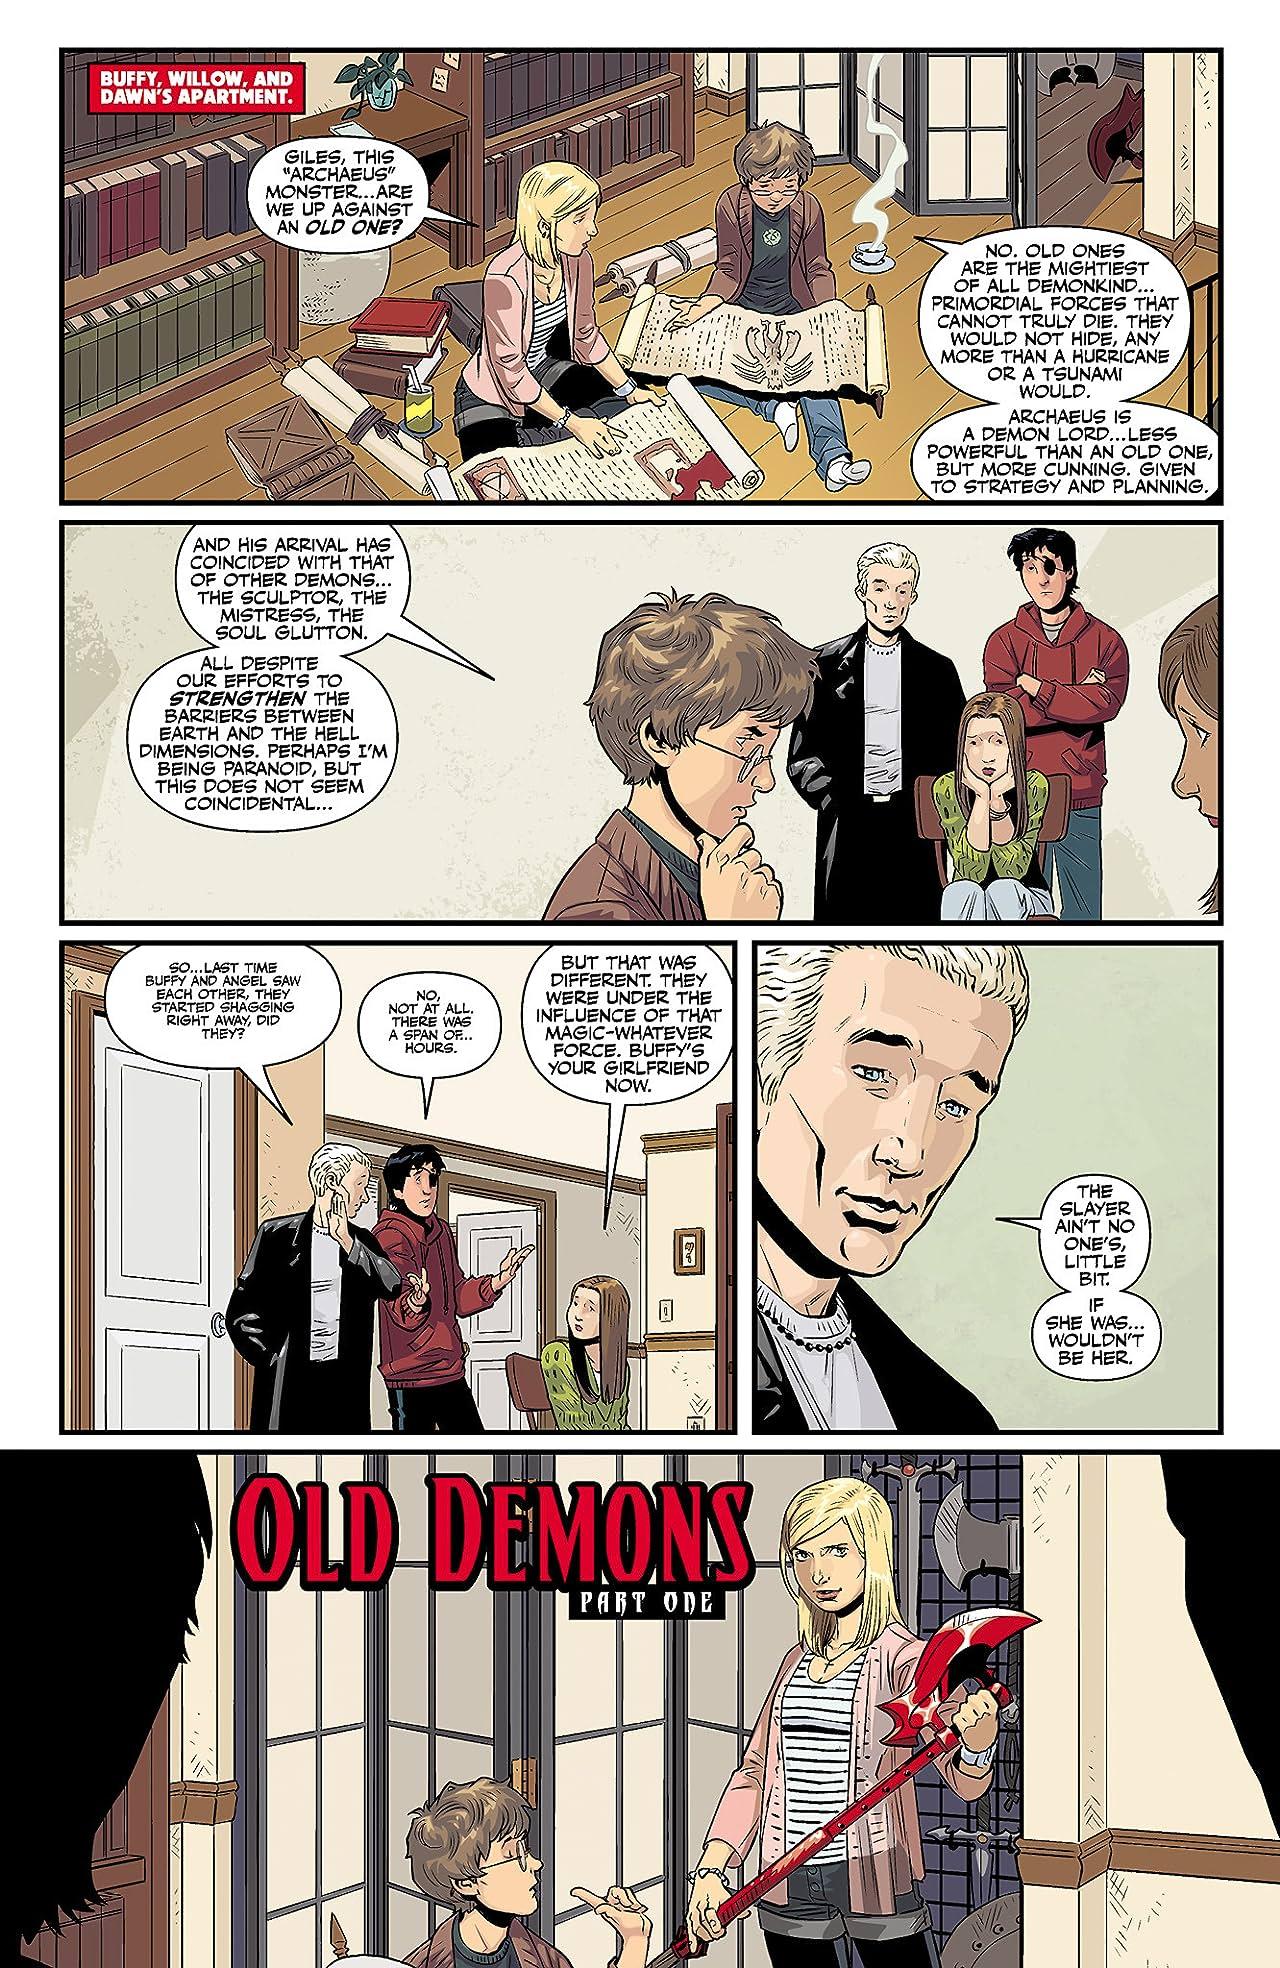 Buffy the Vampire Slayer: Season 10 #16